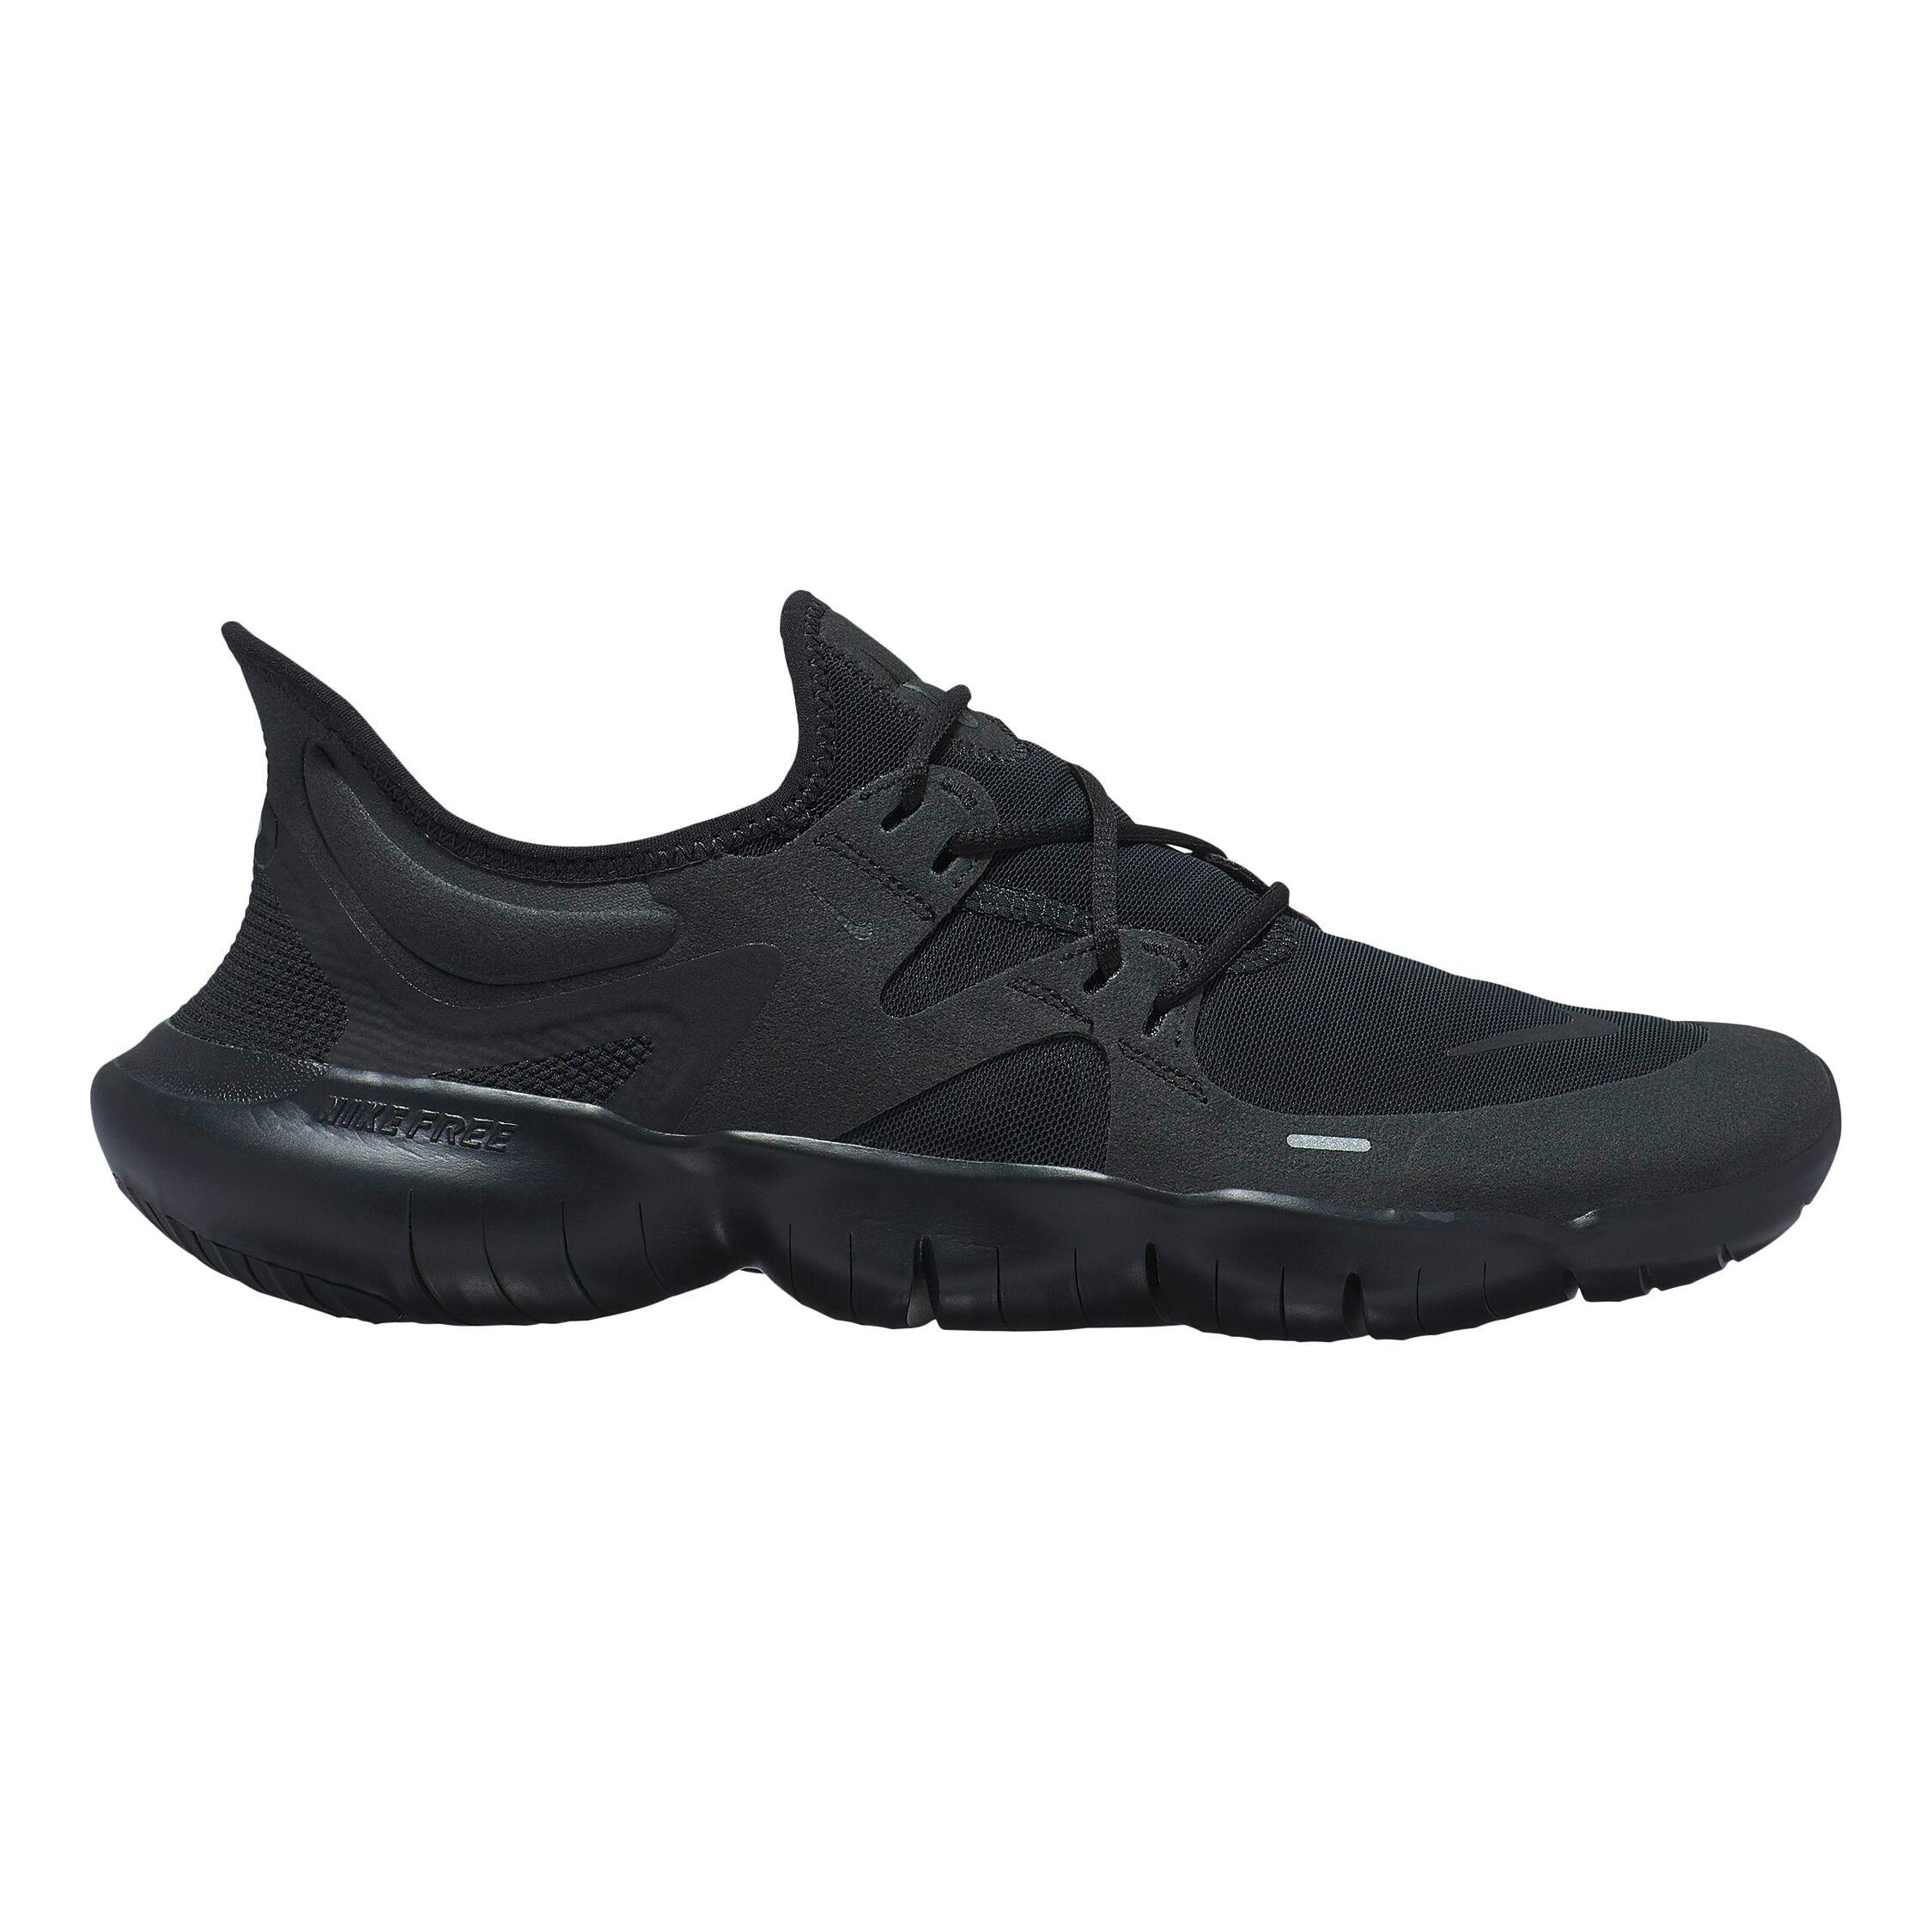 Nike Free 5.0 Schuhe Top Qualität Stark Reduziert 88